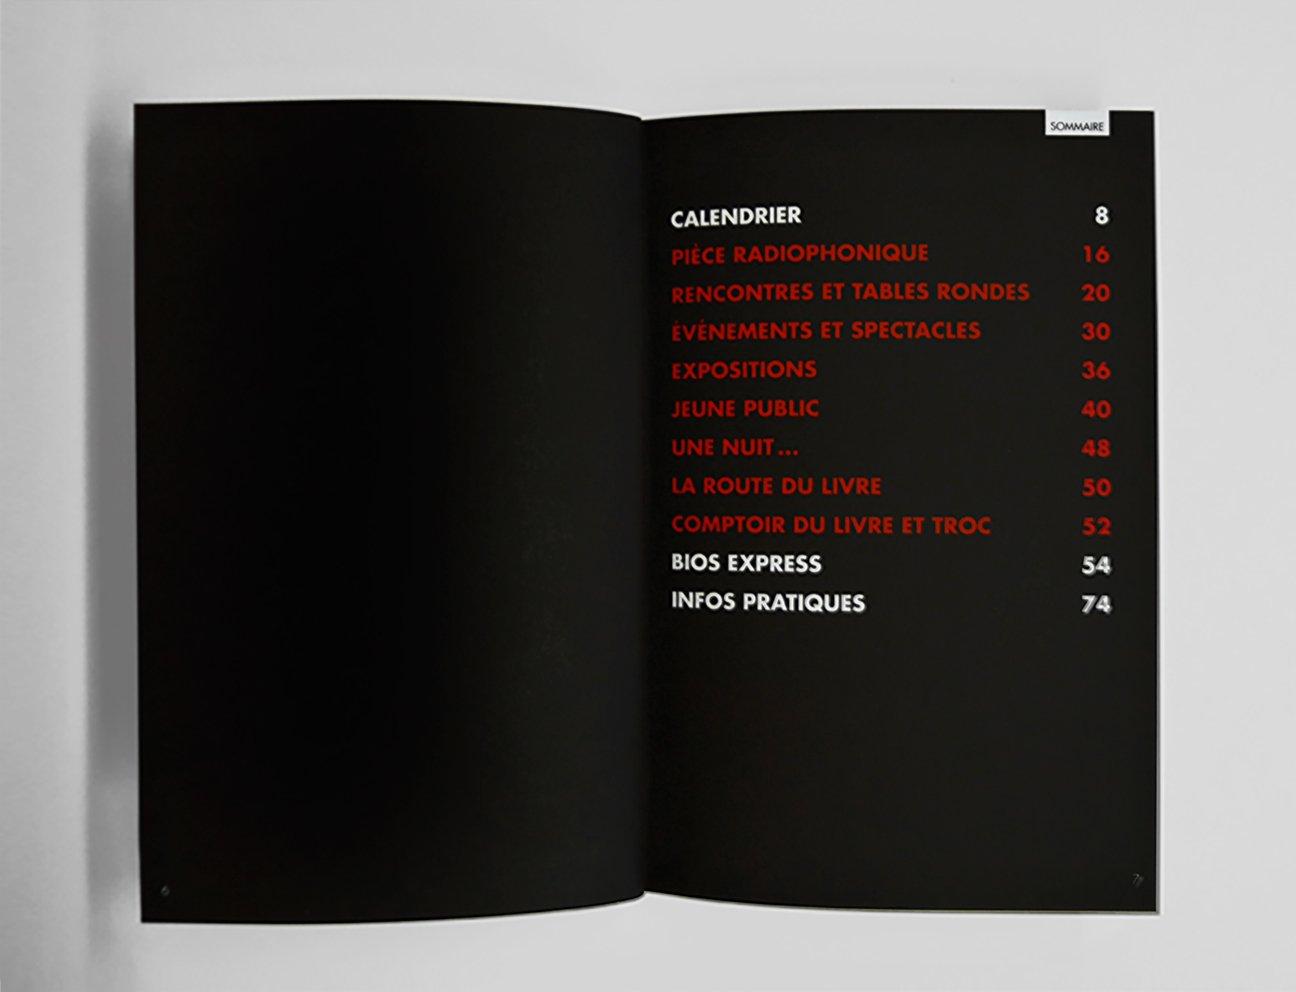 fabien_cuffel_book_festival_litteraire_fureur_lire_2011_inter